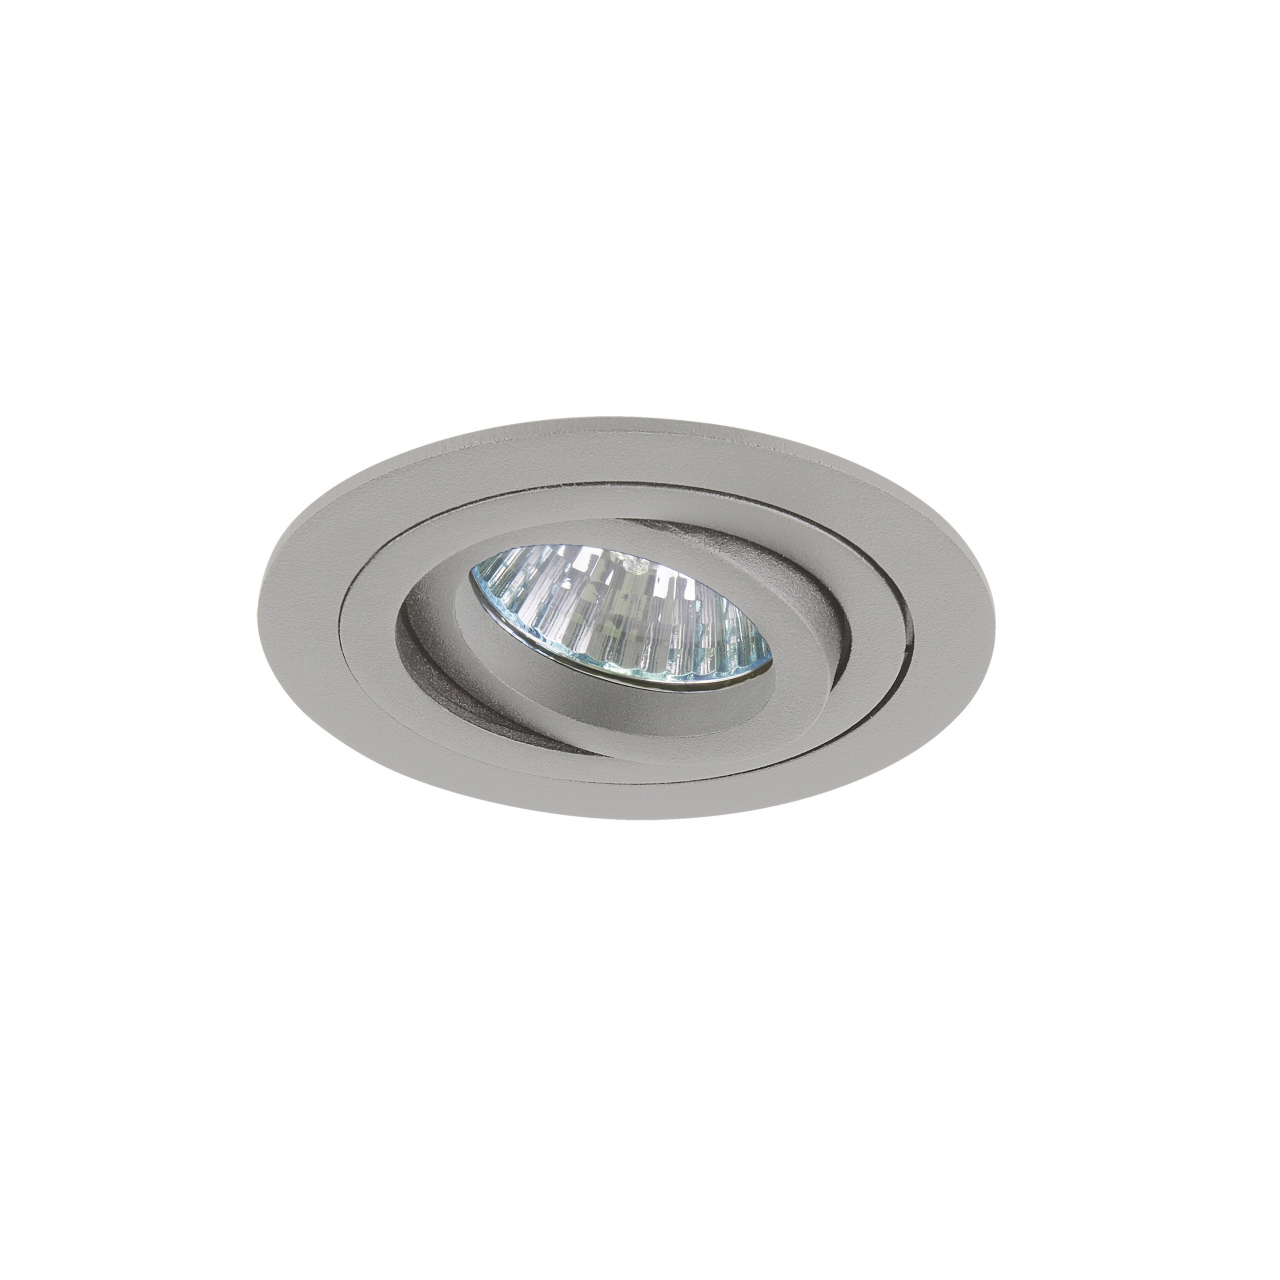 Светильник Intero 16 HP16 серый Lightstar 214219